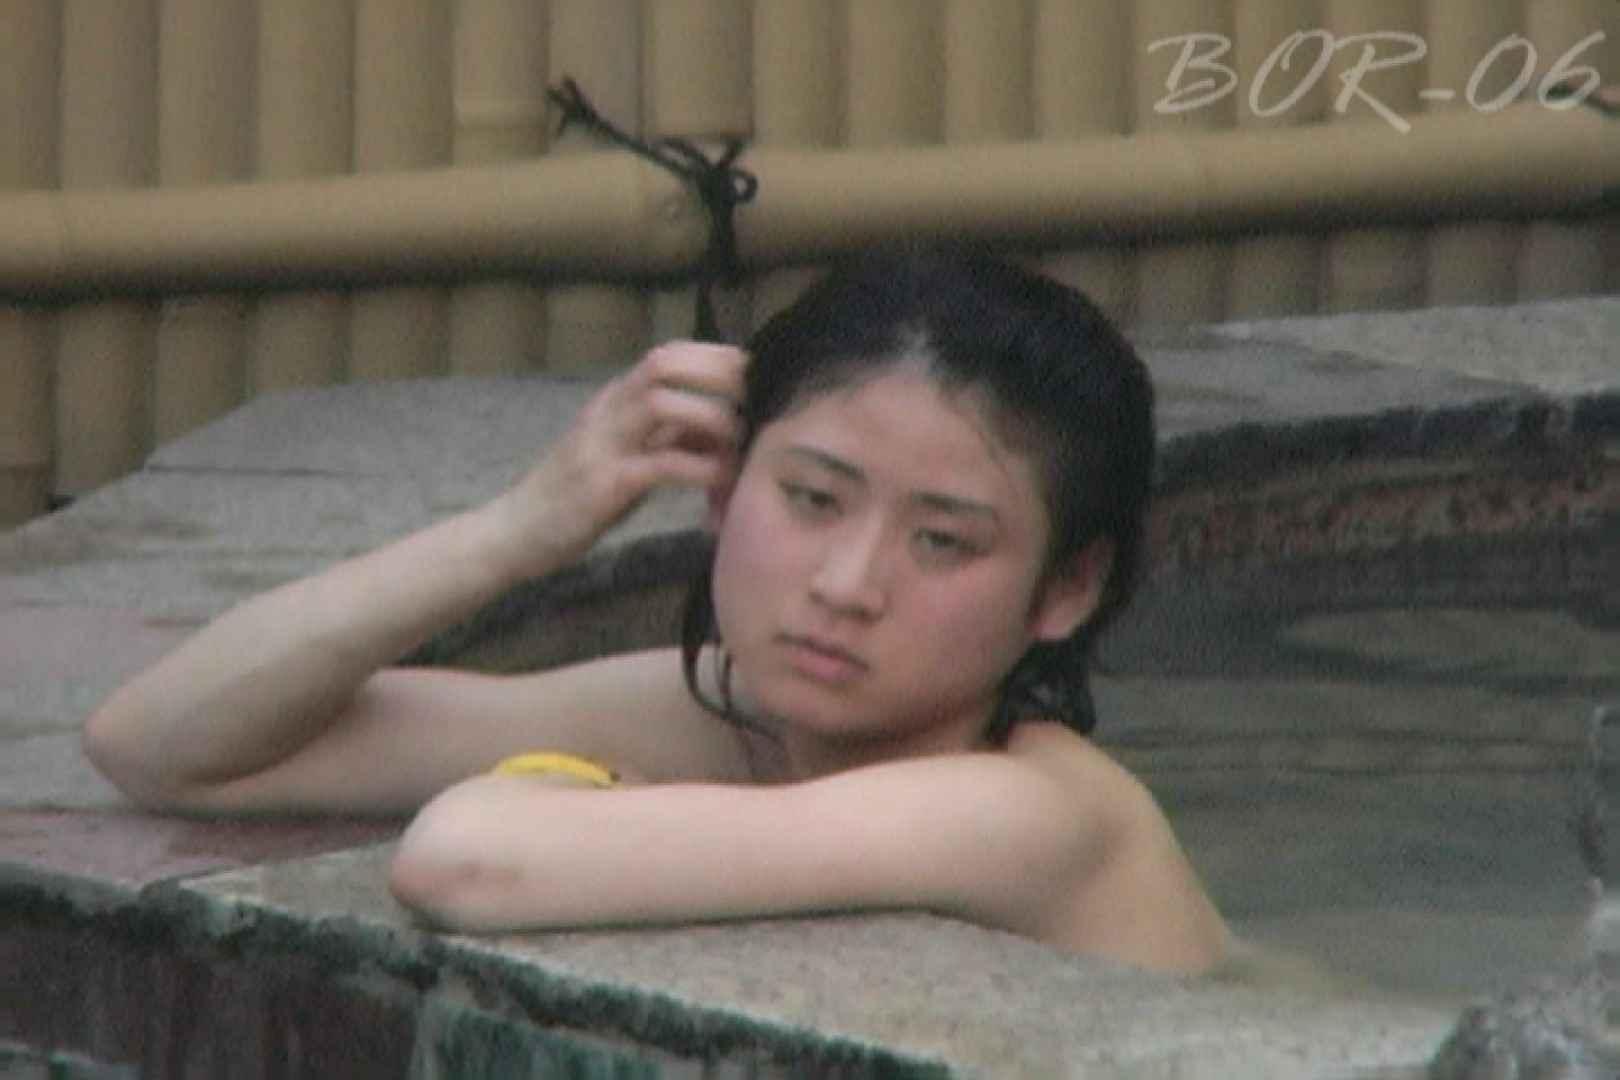 Aquaな露天風呂Vol.520 OL女体  52連発 45